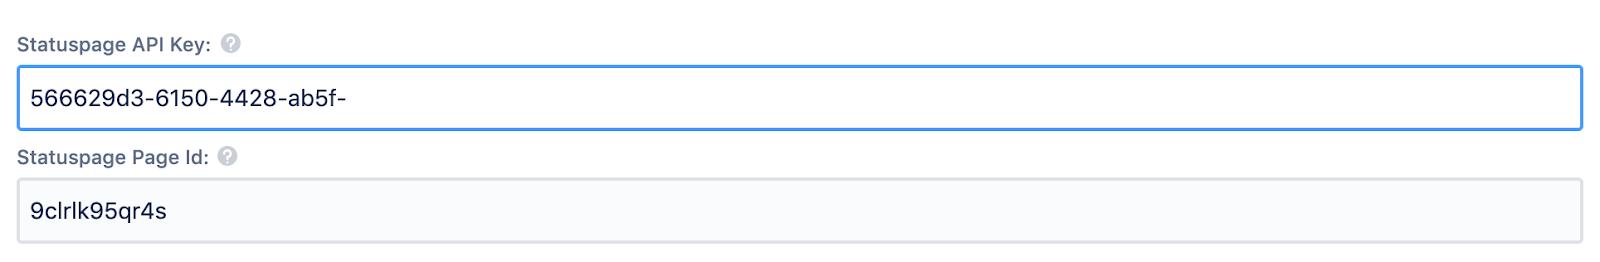 Statuspage API key and ID